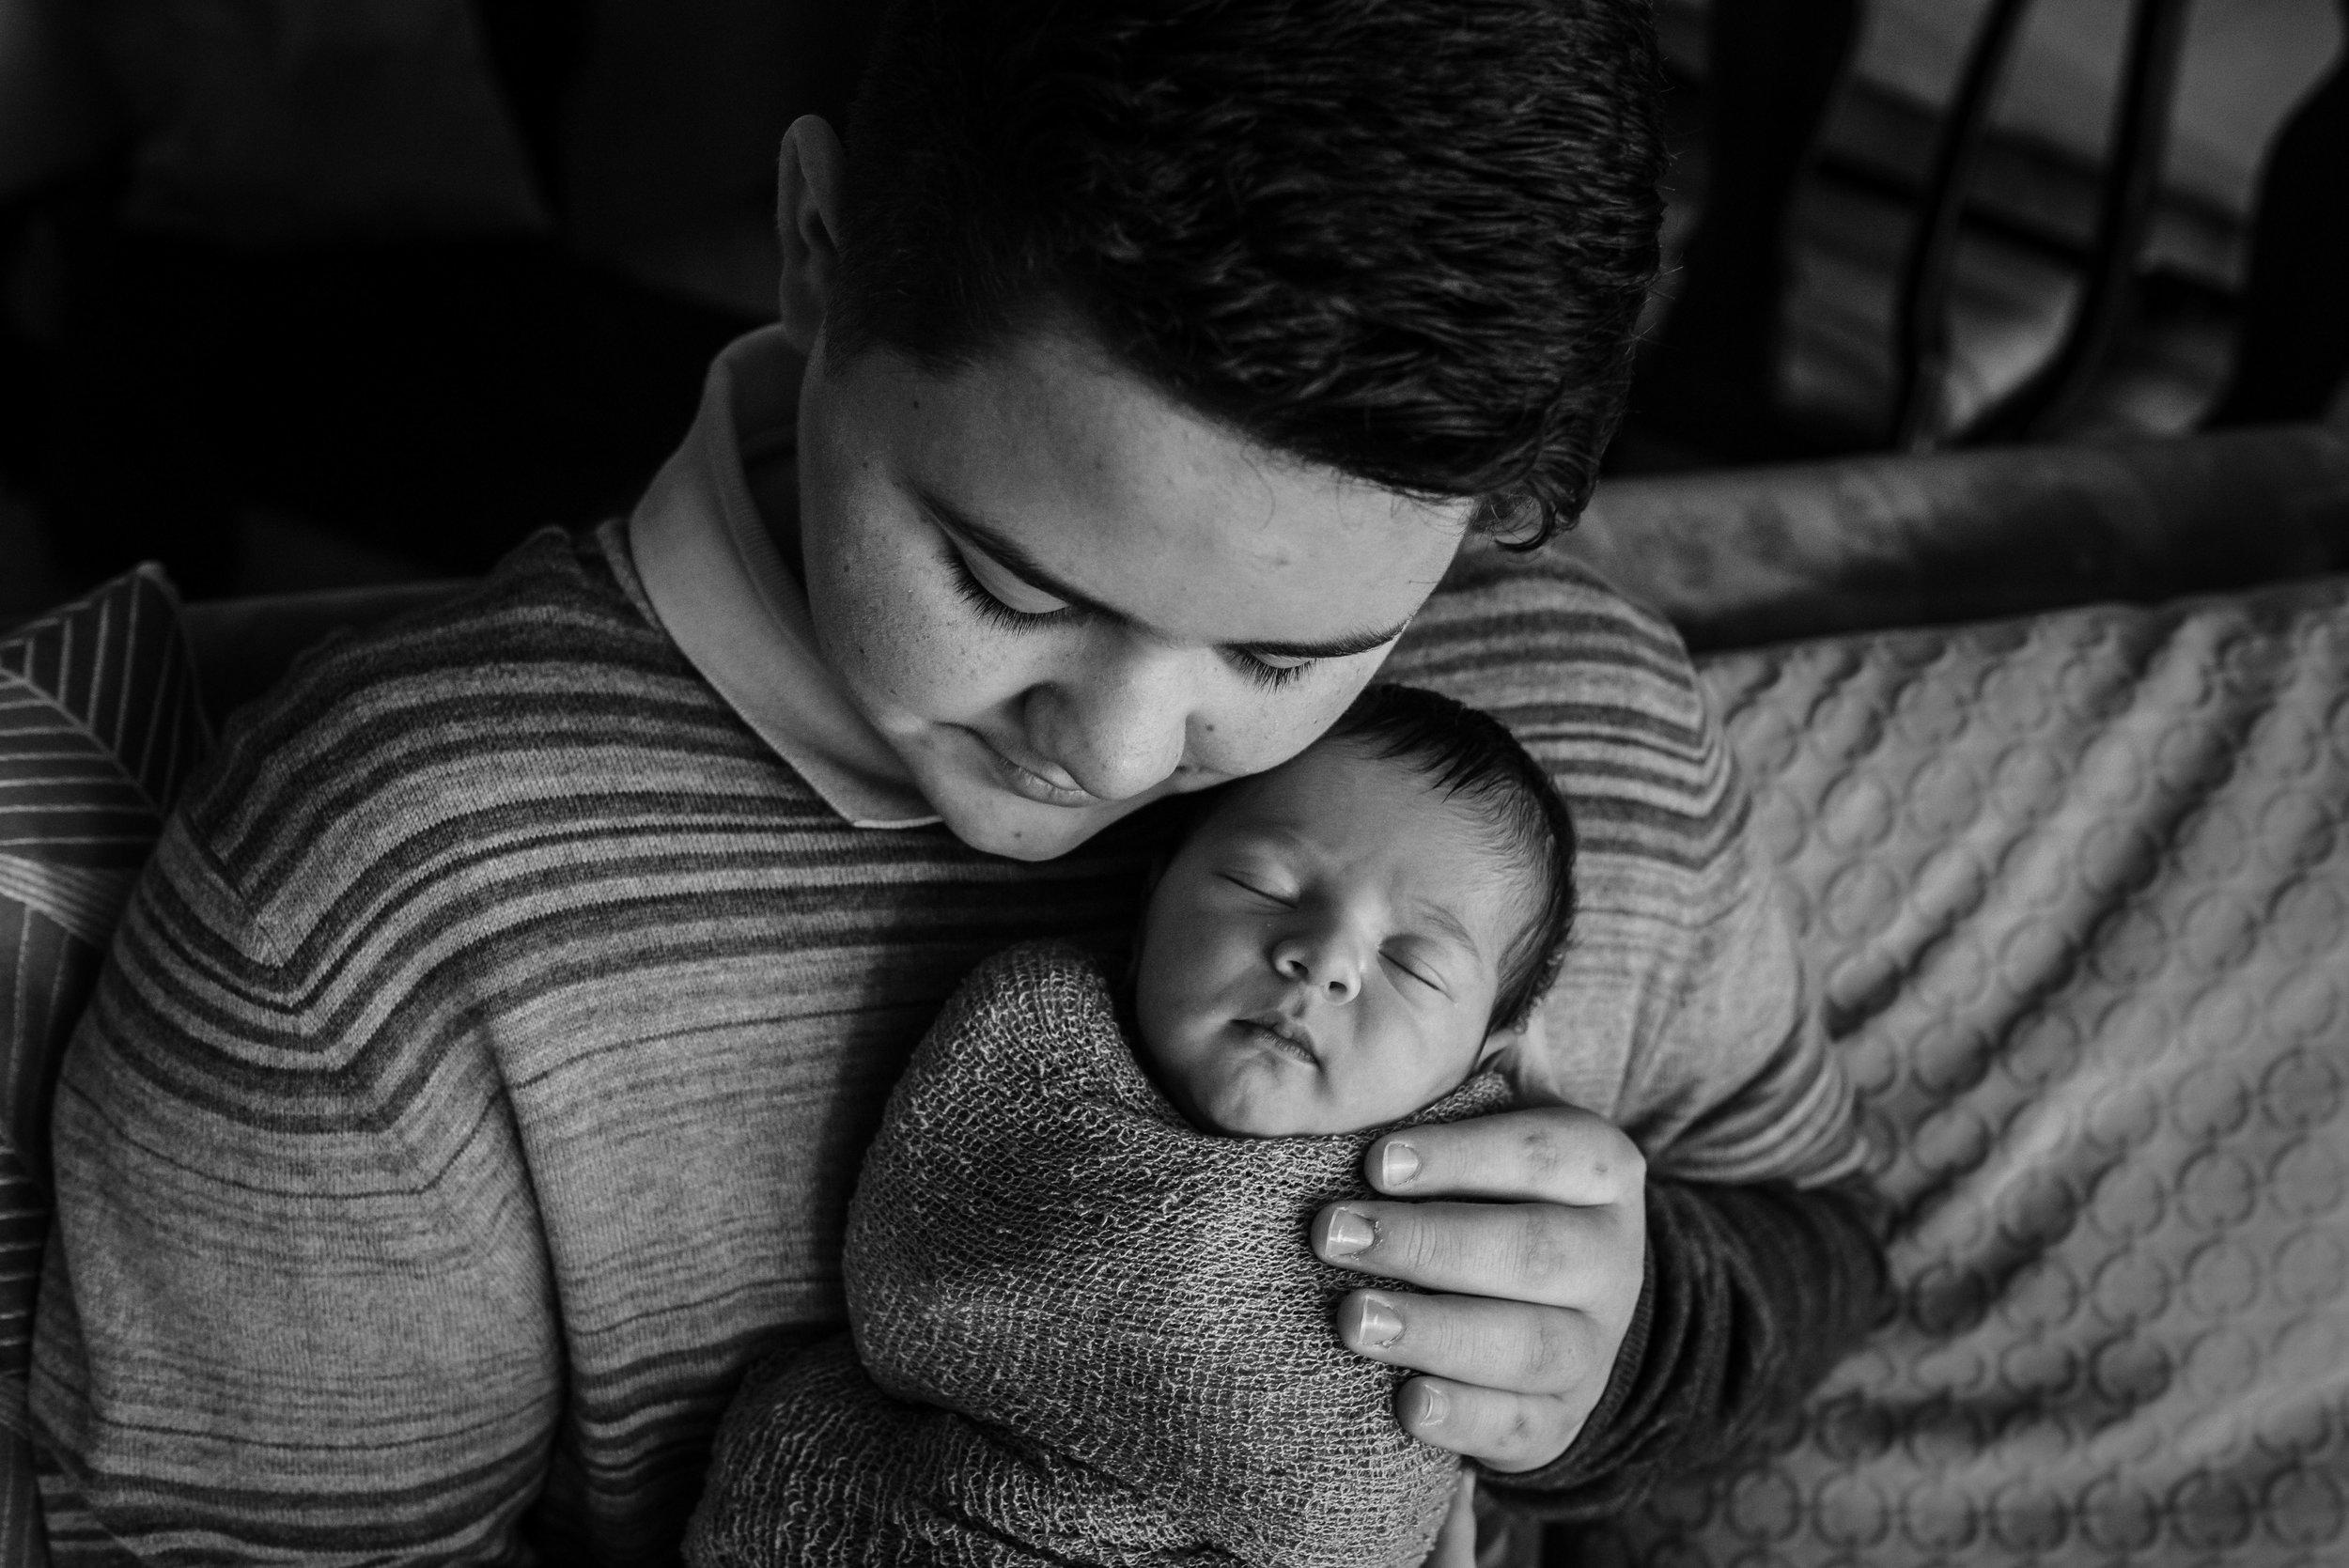 thirteen-year-old-big-brother-holds-newborn